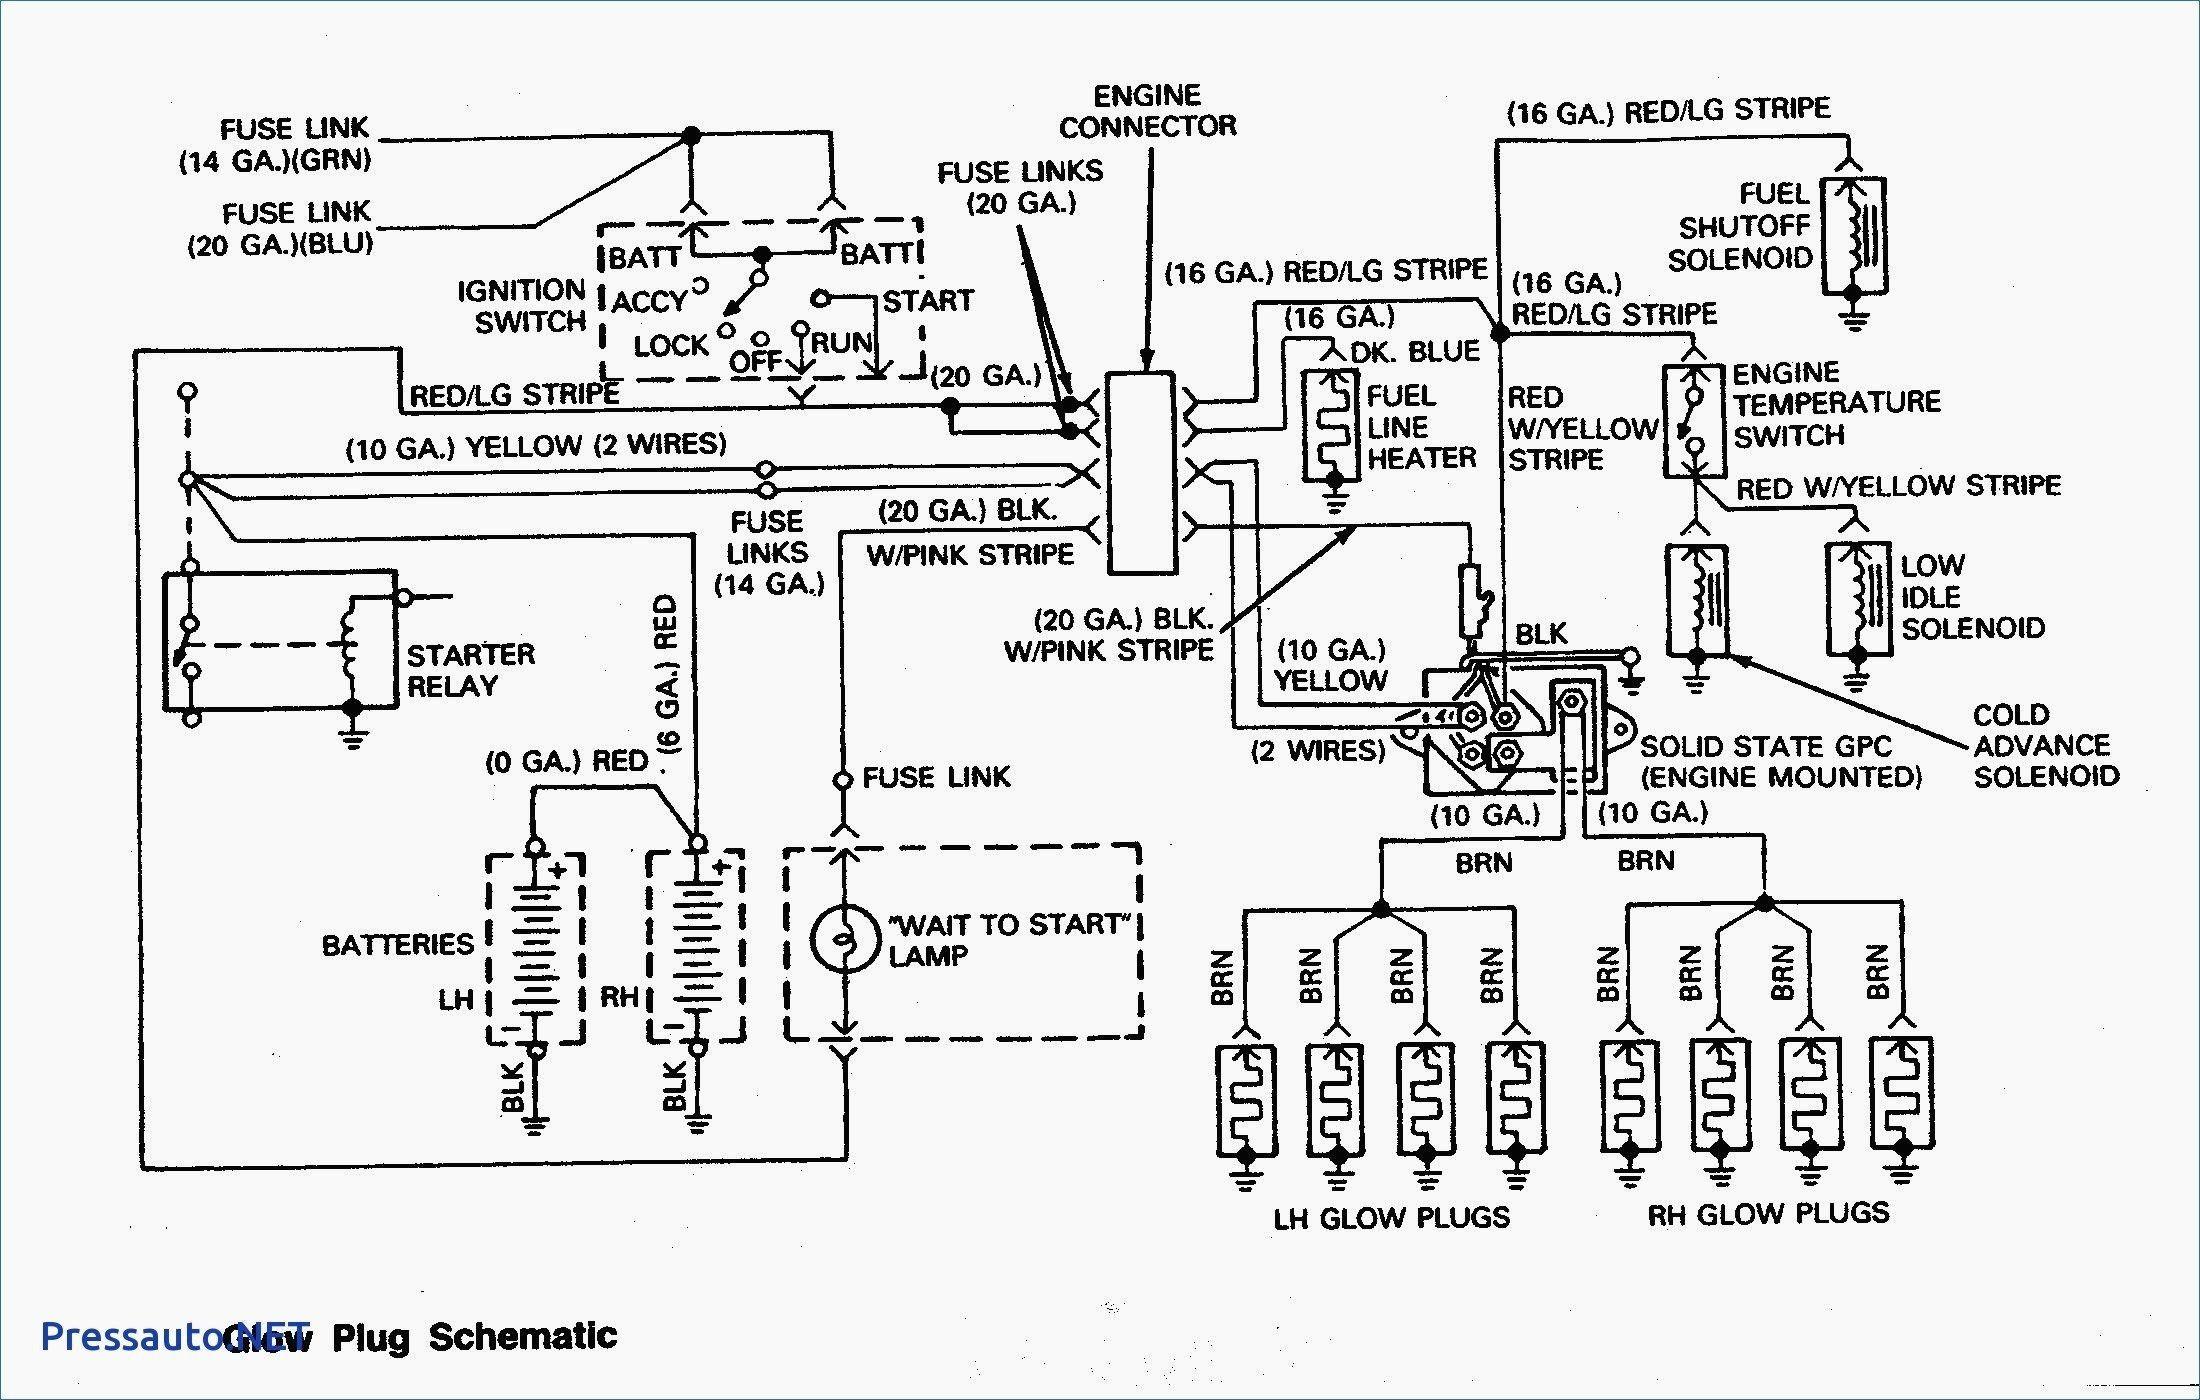 7.3 Idi Glow Plug Relay Wiring Diagram Archives - Kobecityinfo - 7.3 Idi Glow Plug Controller Wiring Diagram